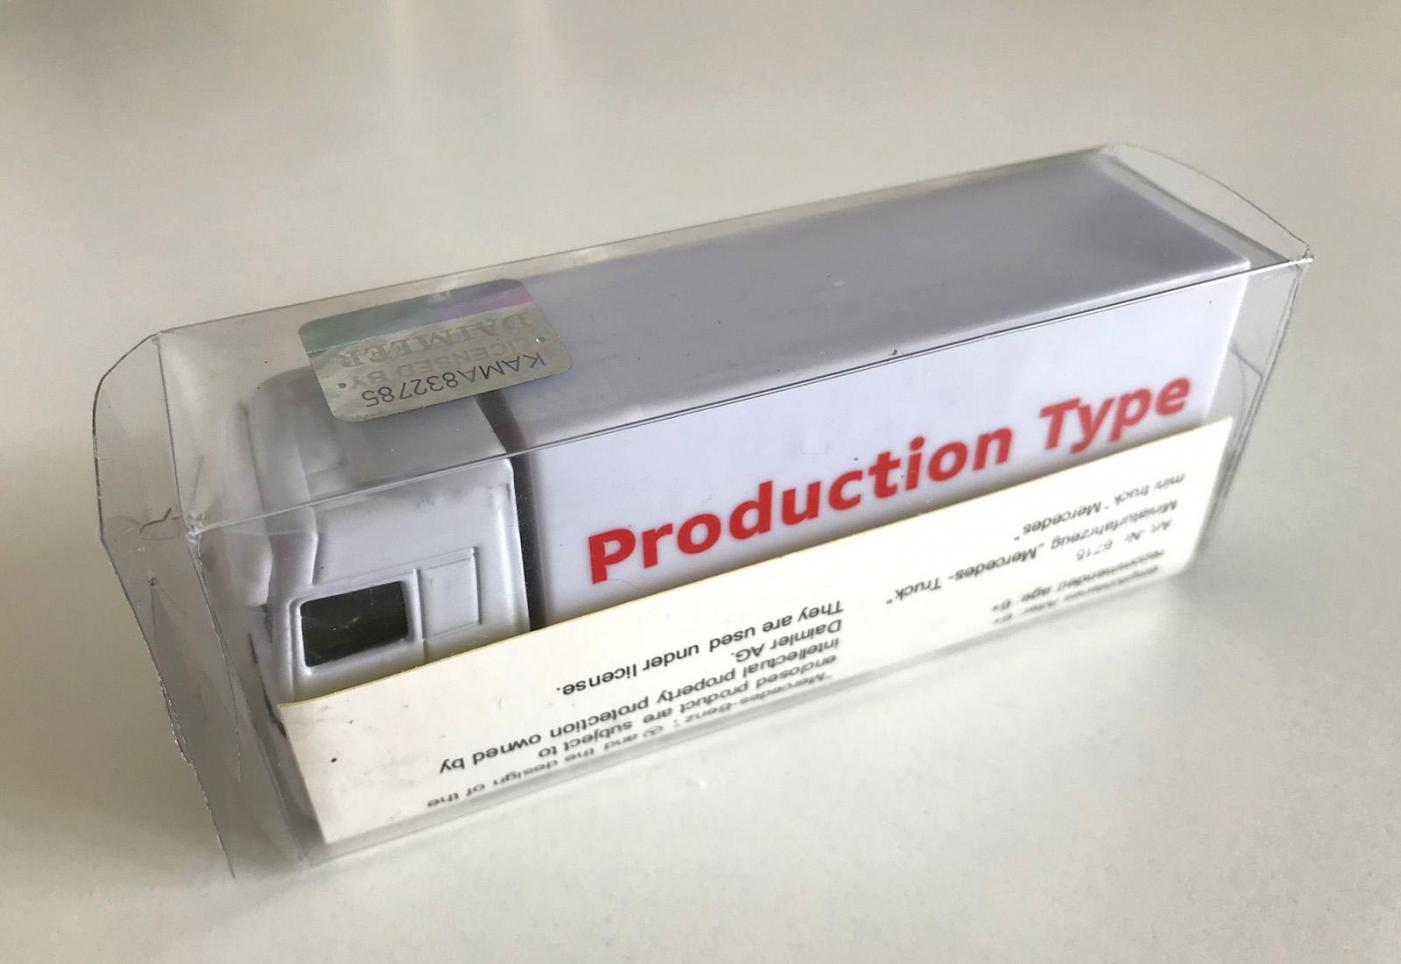 ProductionTypeTruck.thumb.jpg.5b1b73d609fa2e593f36ccc10560b2e2.jpg